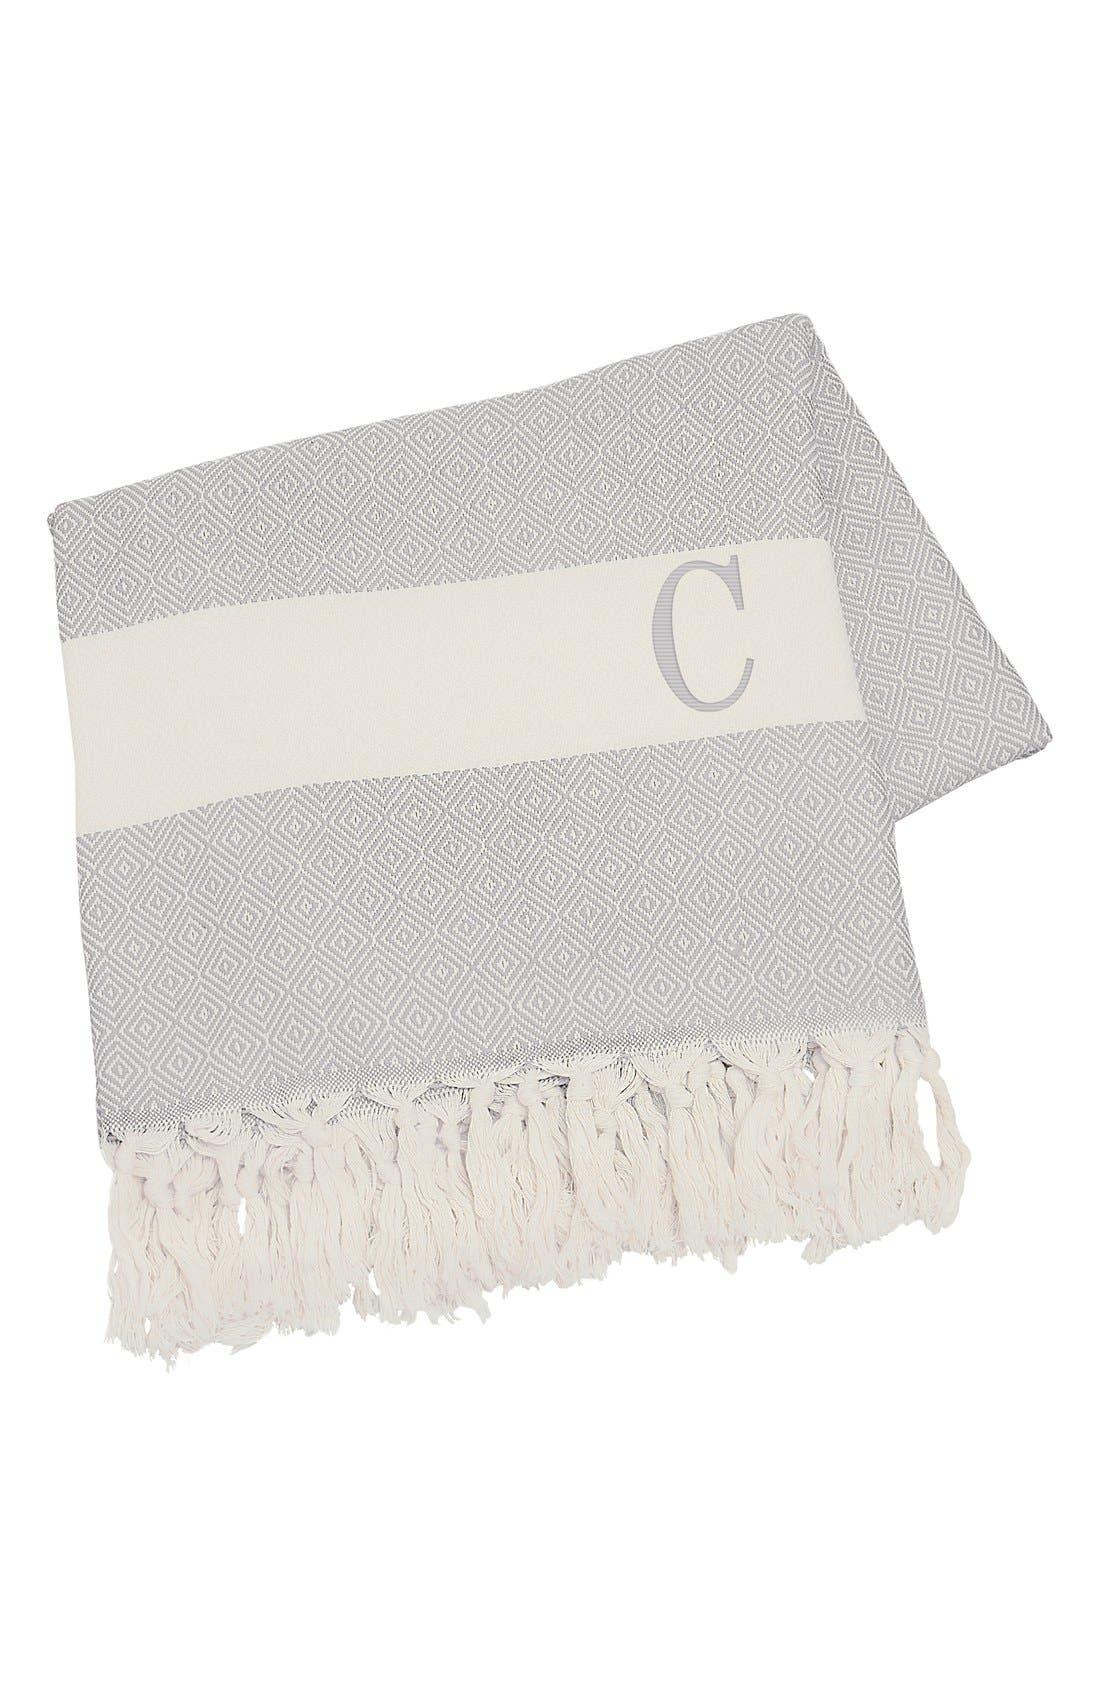 Monogram Turkish Cotton Throw,                             Main thumbnail 5, color,